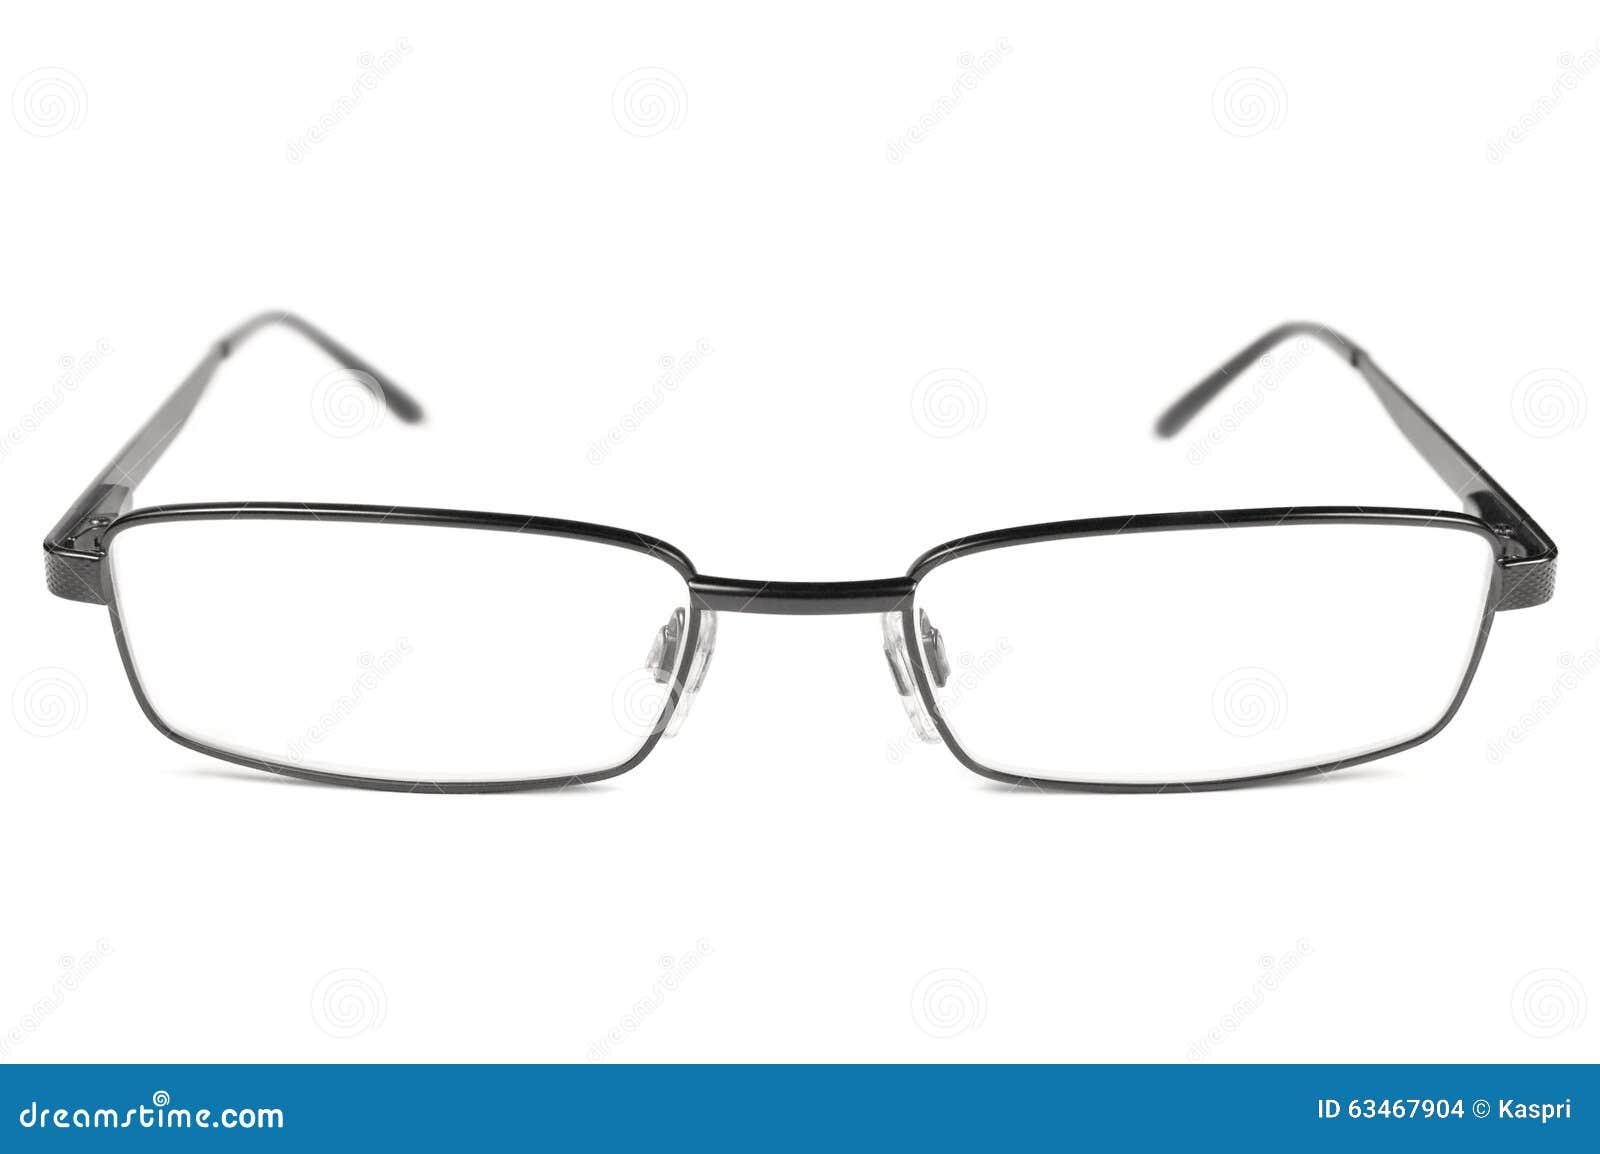 Eyeglasses, Black Men Spectacles, Titanium Frame, Isolated ...